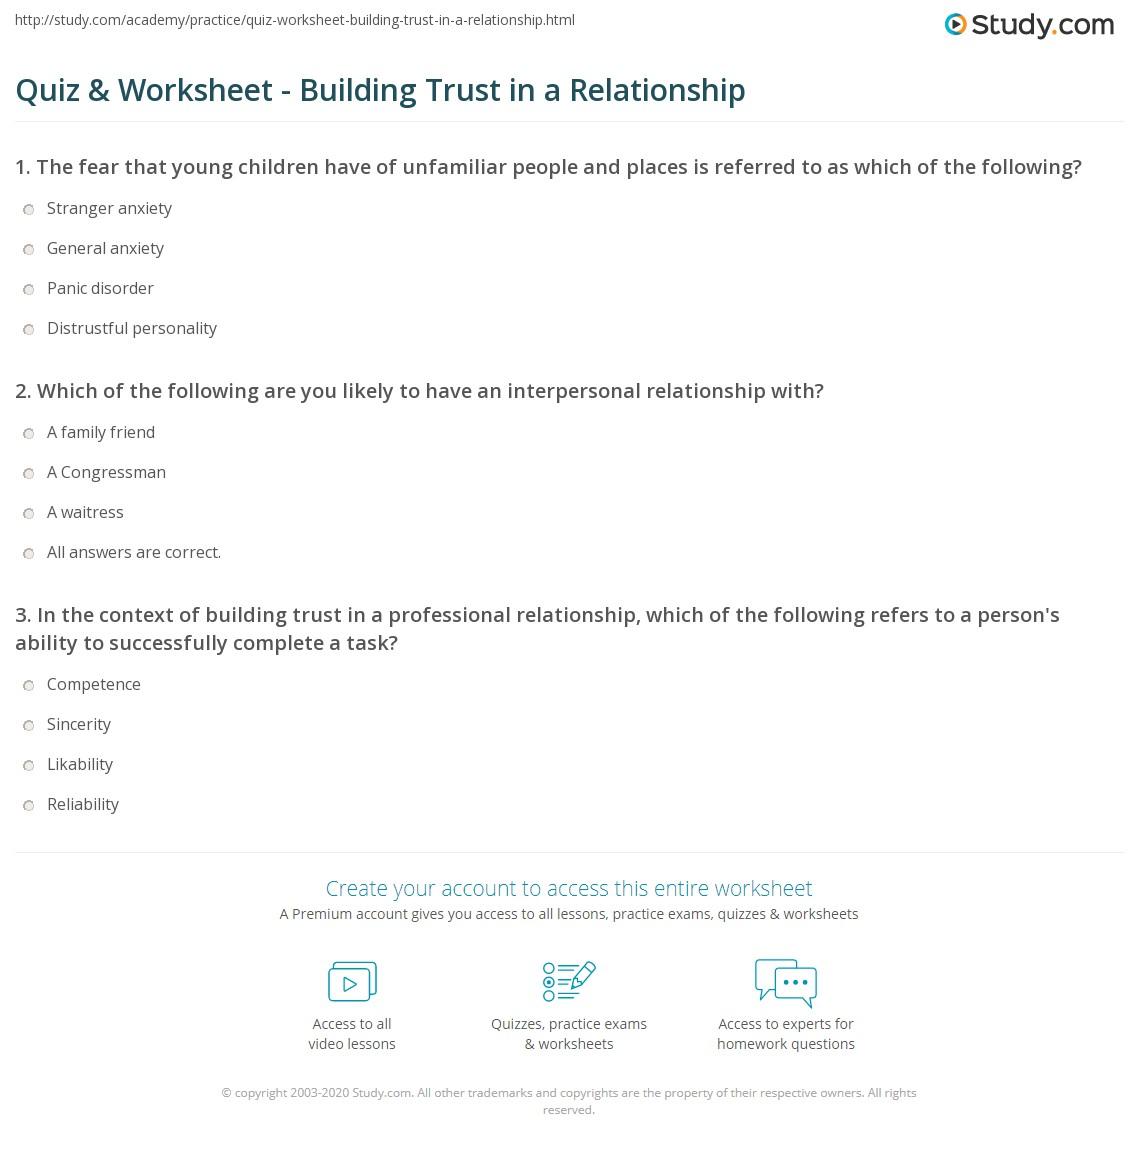 worksheet Relationship Counseling Worksheets quiz worksheet building trust in a relationship study com print how to build worksheet